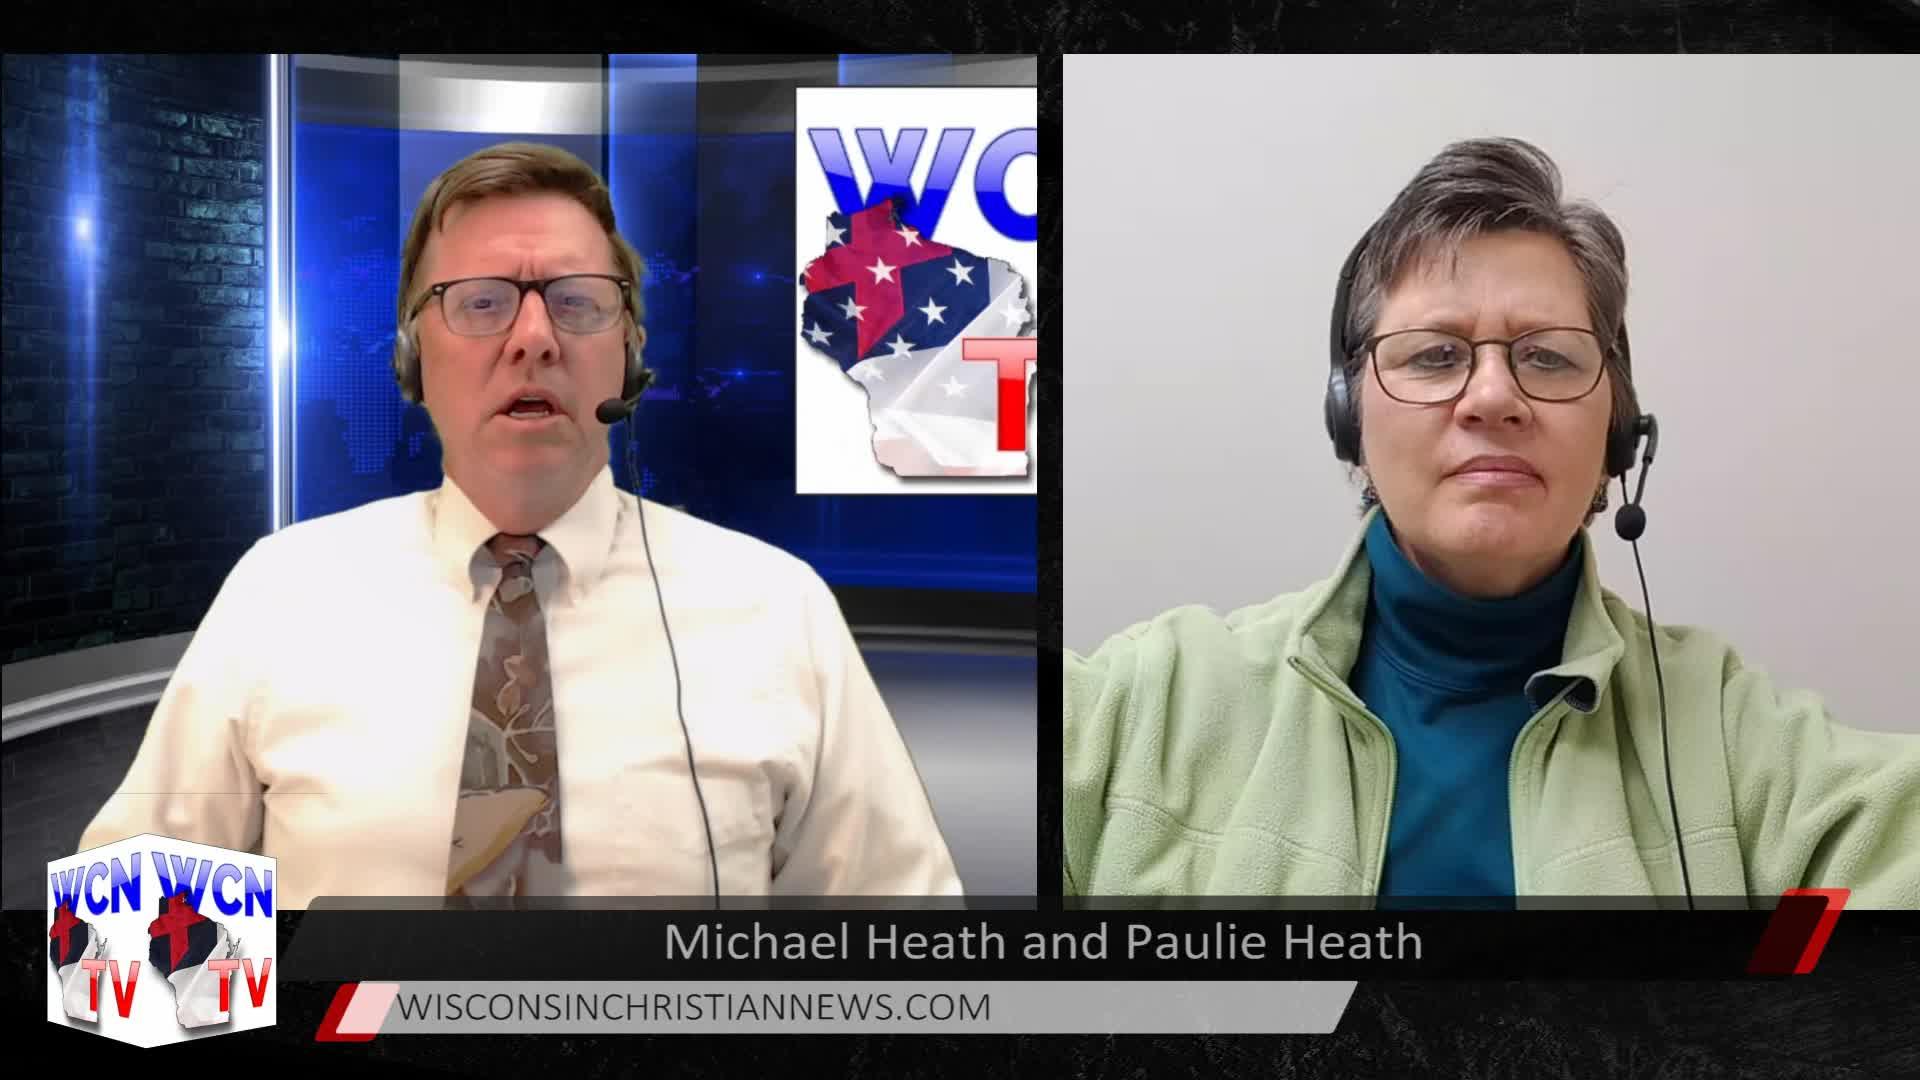 WCN-TV - December 30,2020 - Mike Heath with Guest Paulie Heath